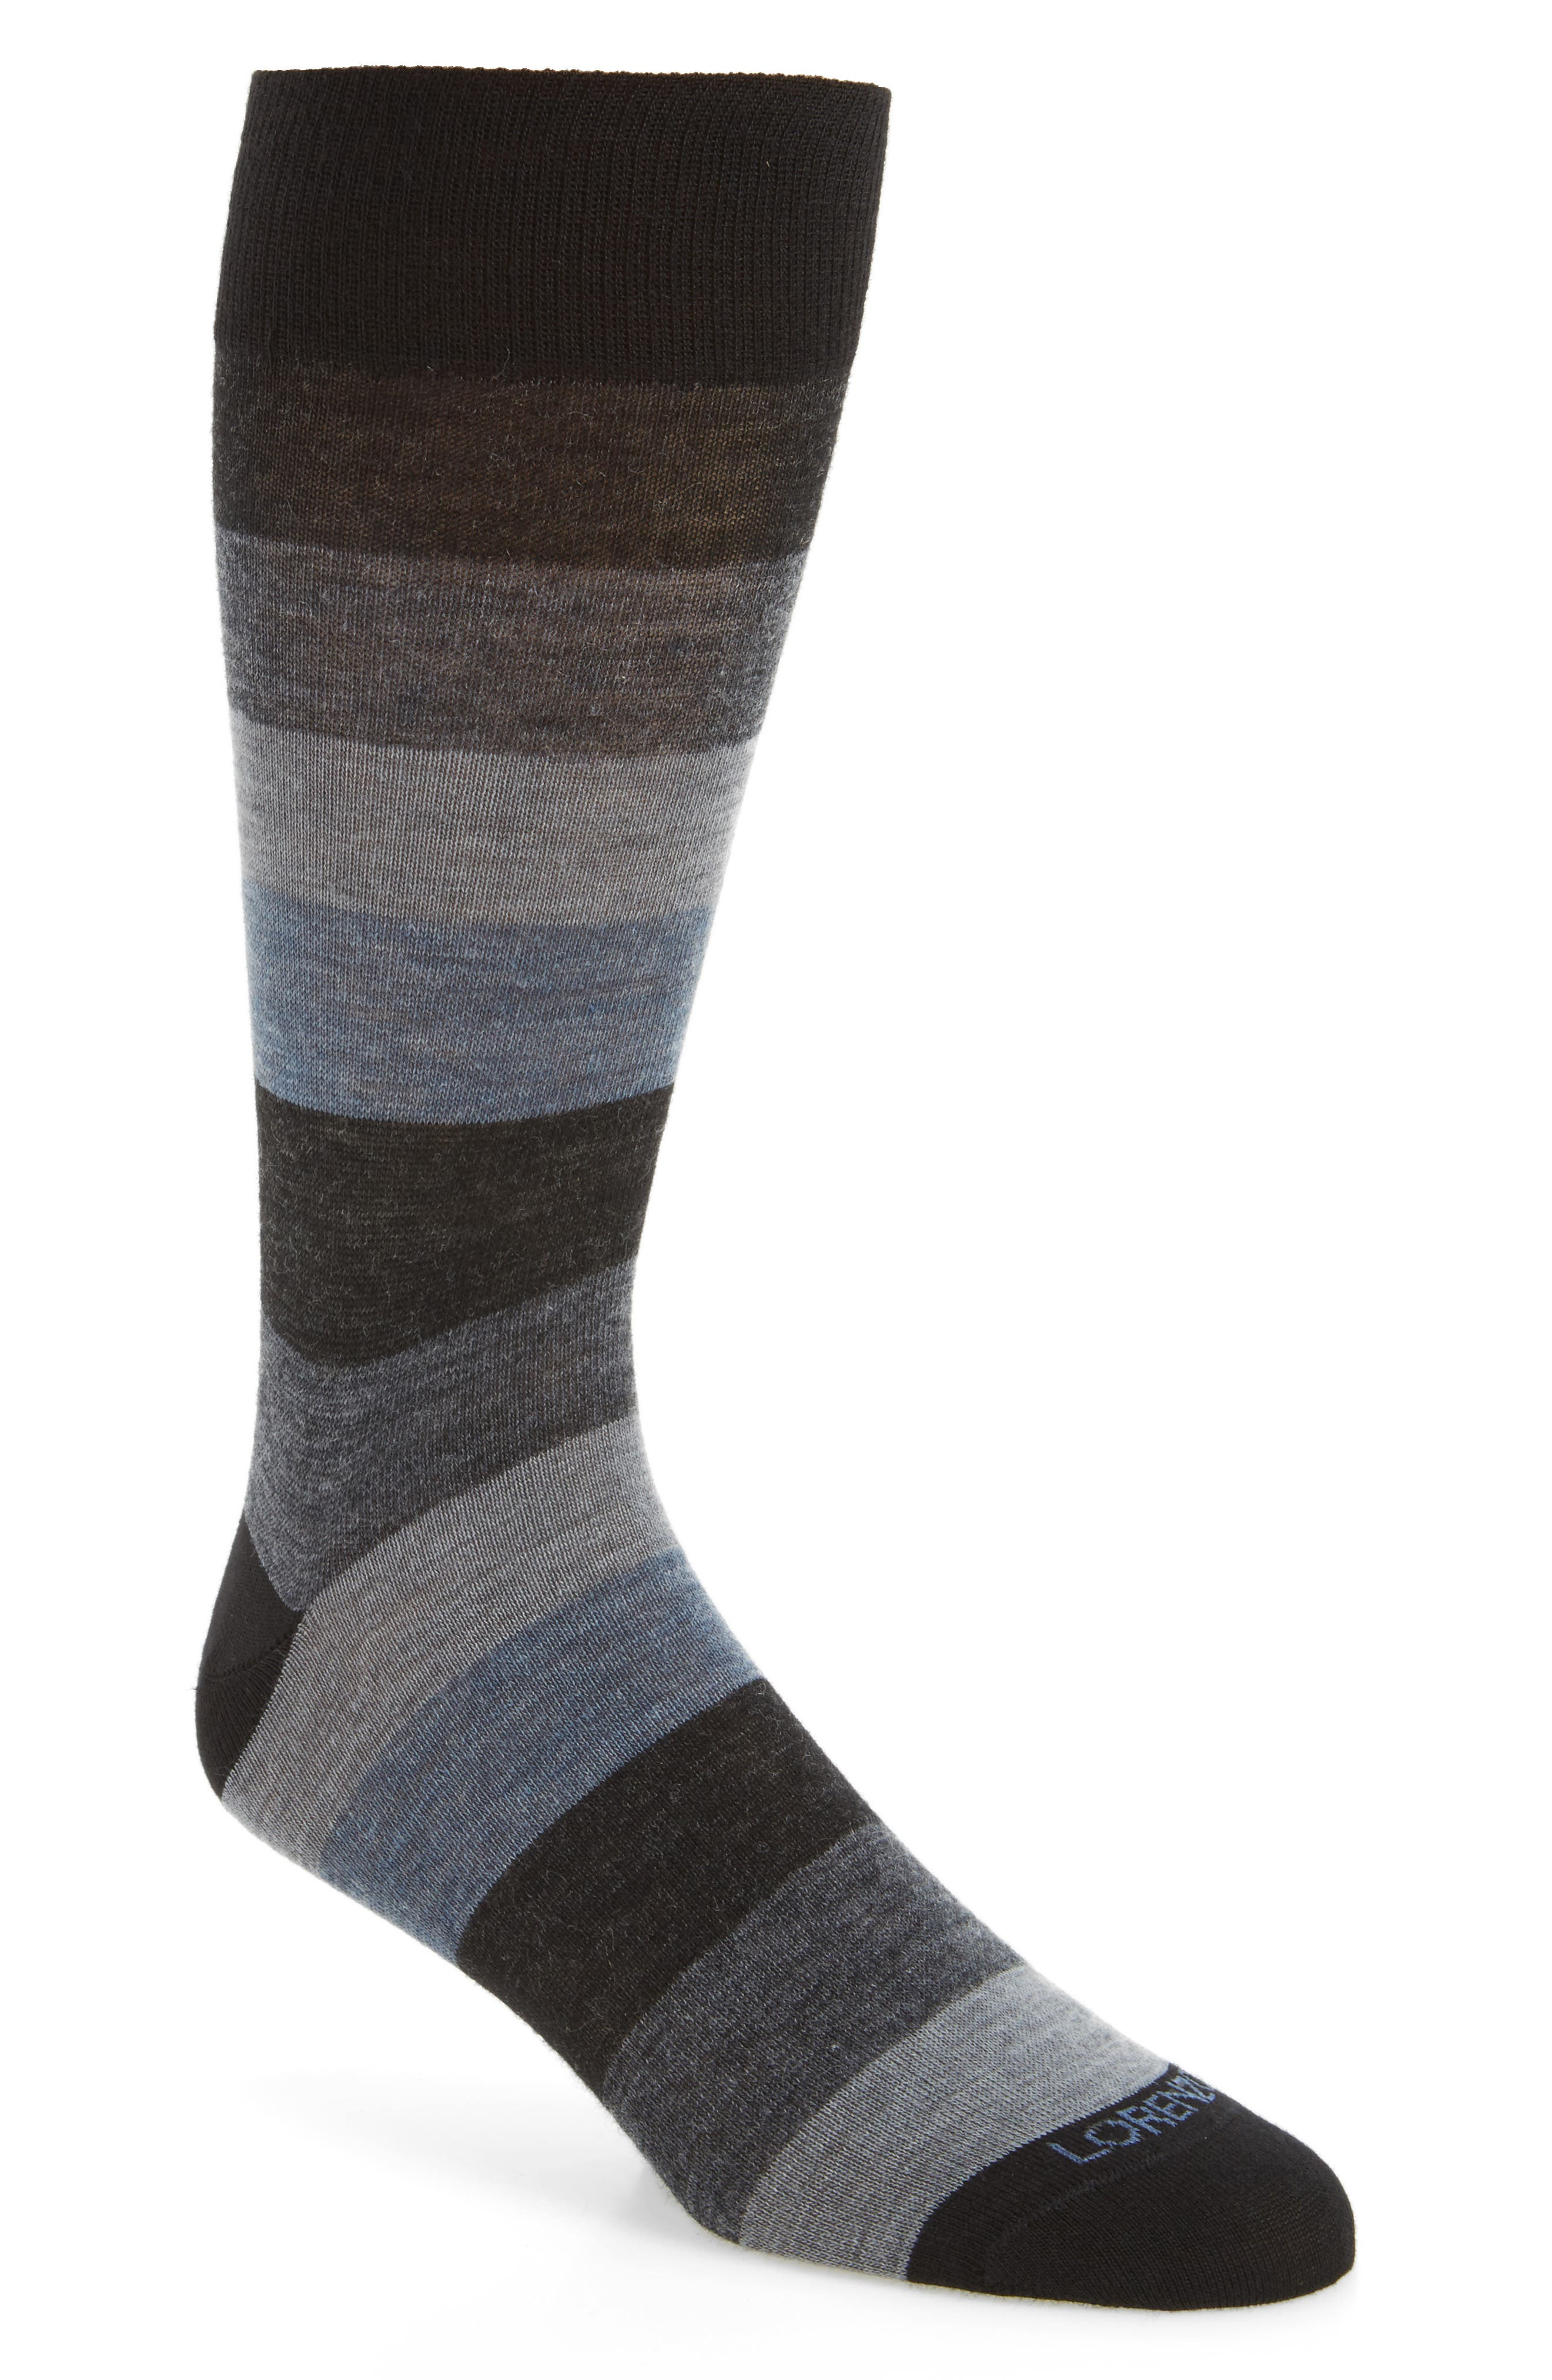 Main Image - Lorenzo Uomo Colorblock Socks (3 for $30)